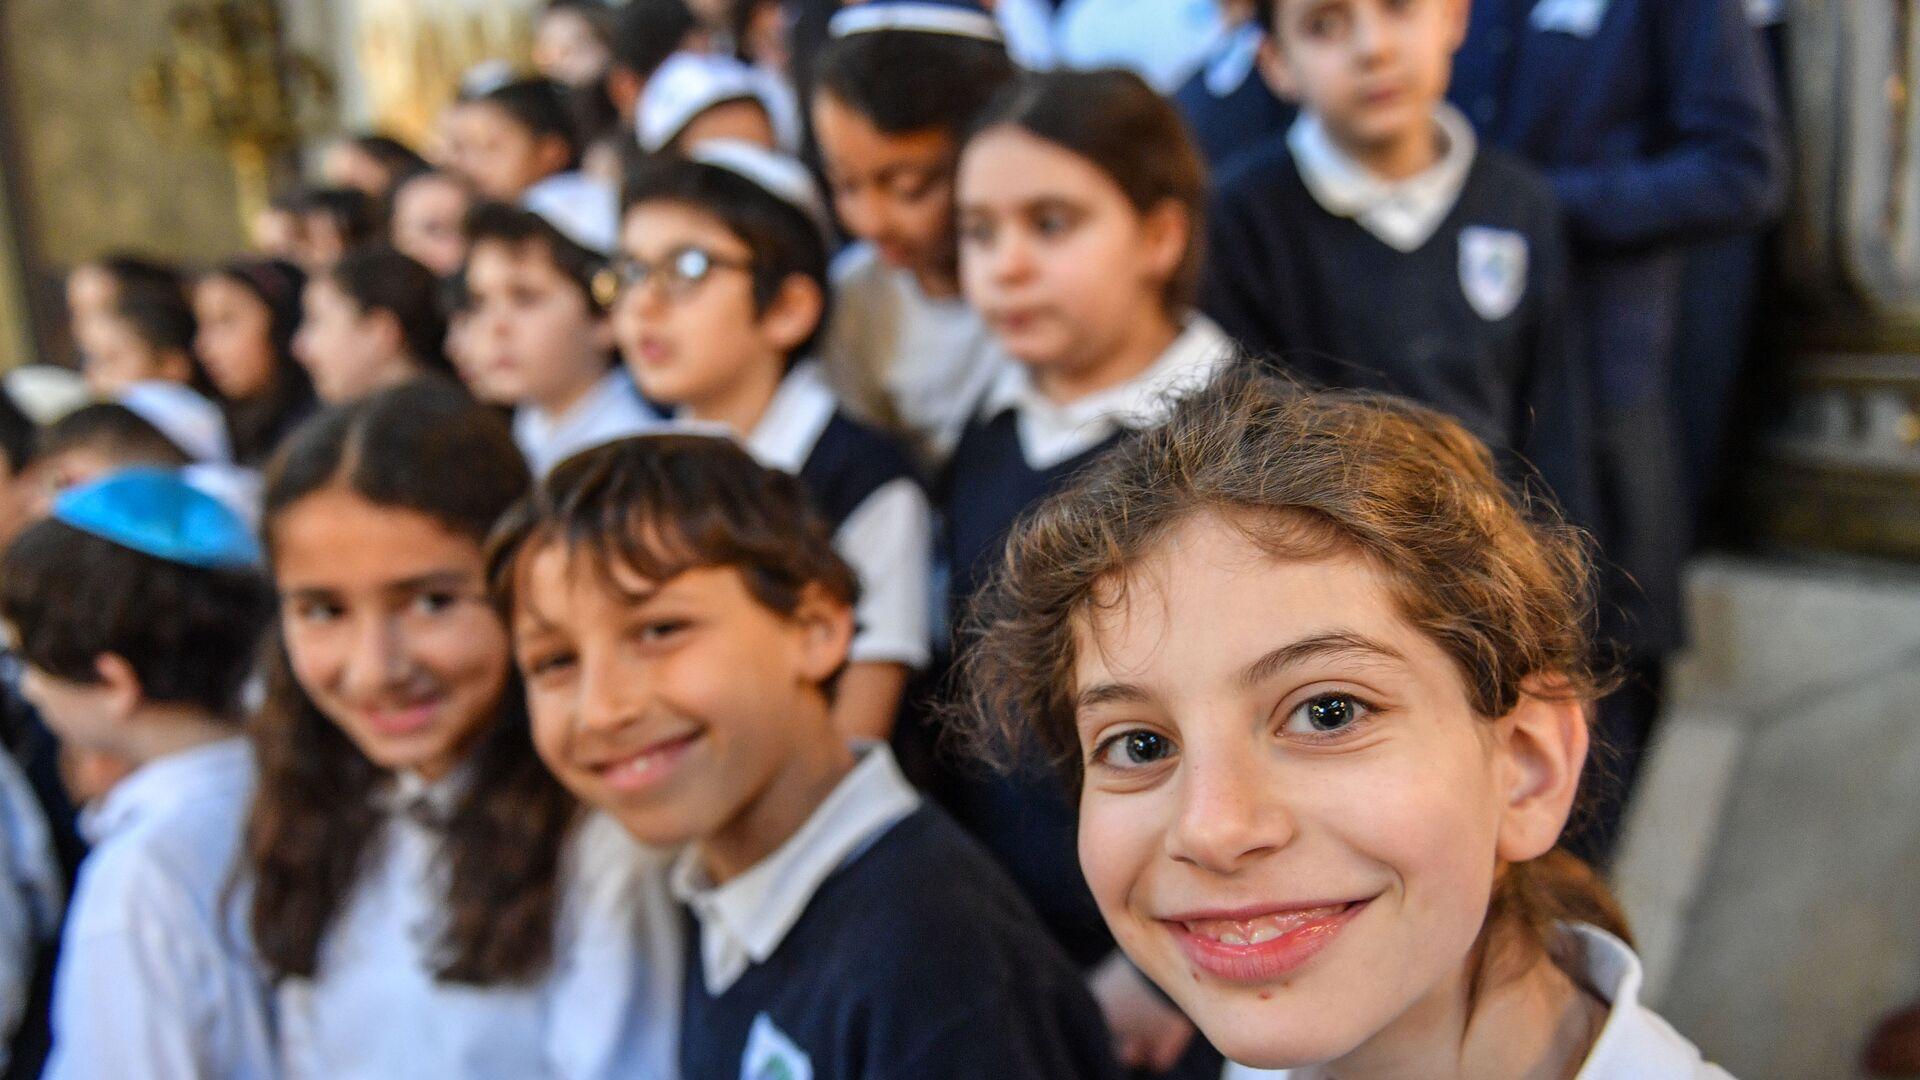 Bambini in una sinagoga - Sputnik Italia, 1920, 22.08.2021